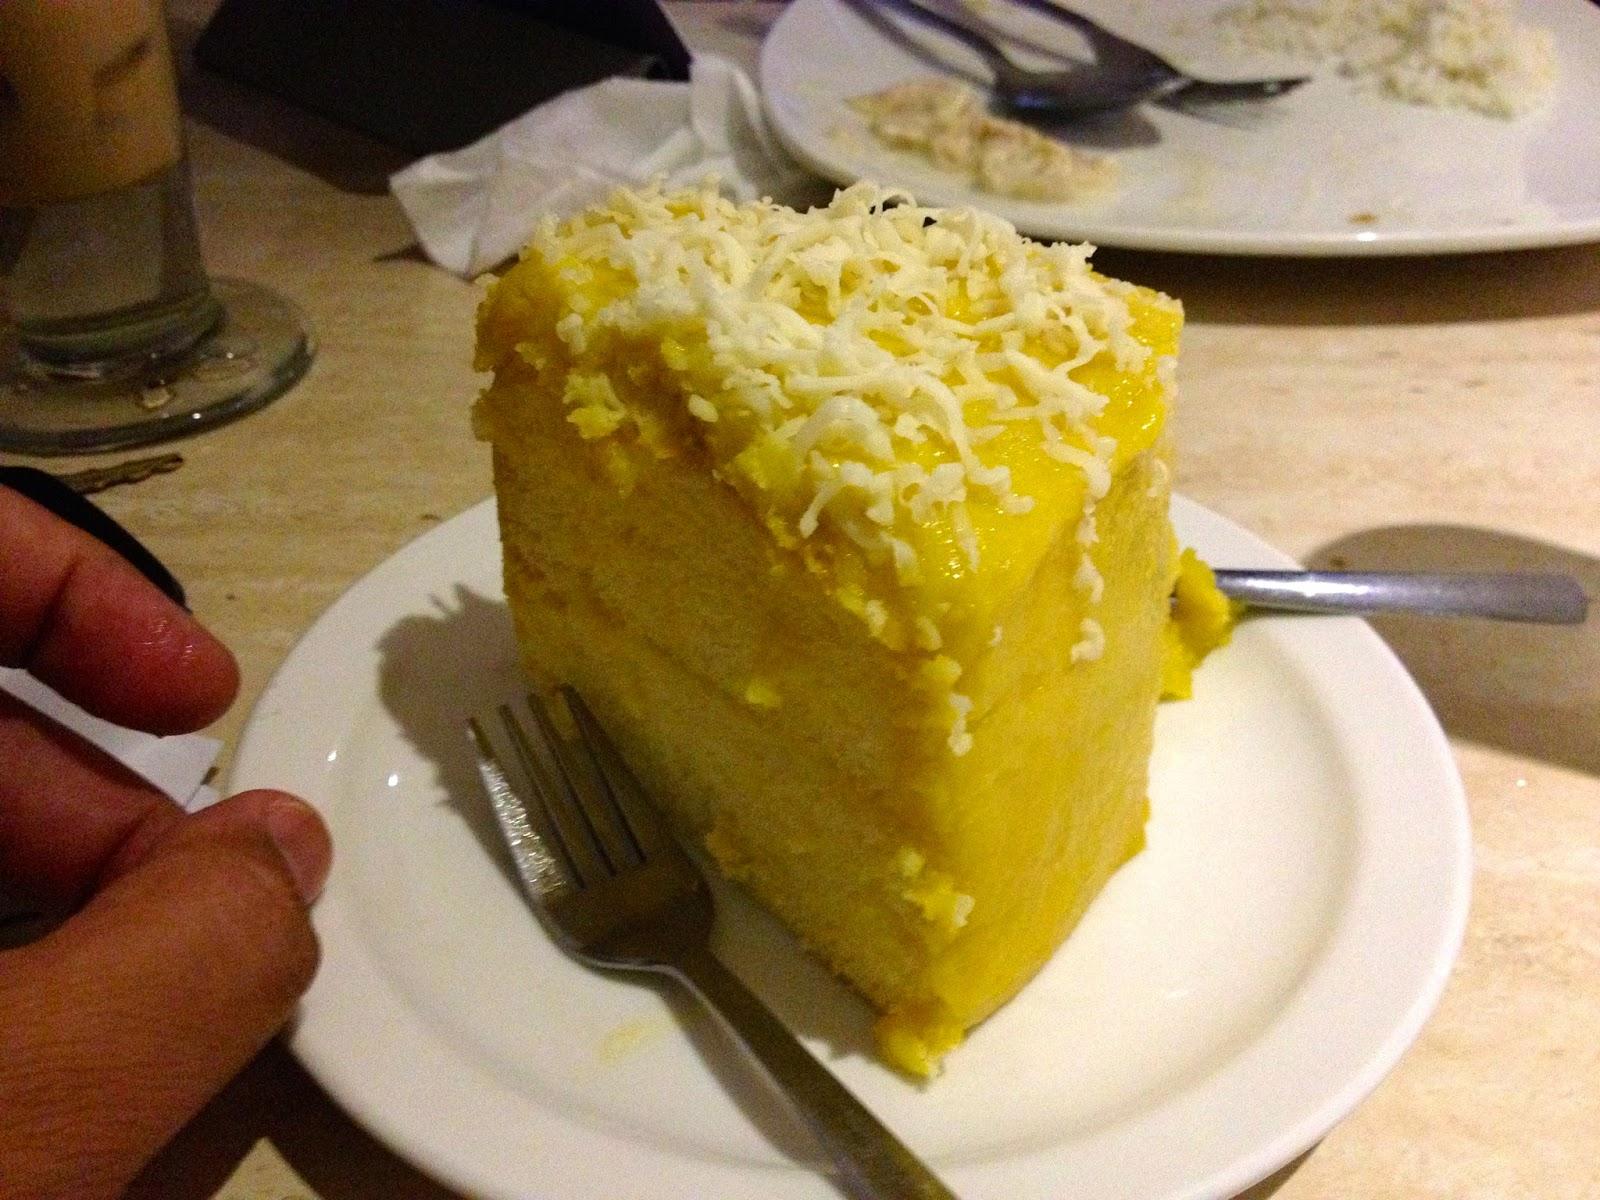 Cambia Street Cafe and Resto Cebu dessert